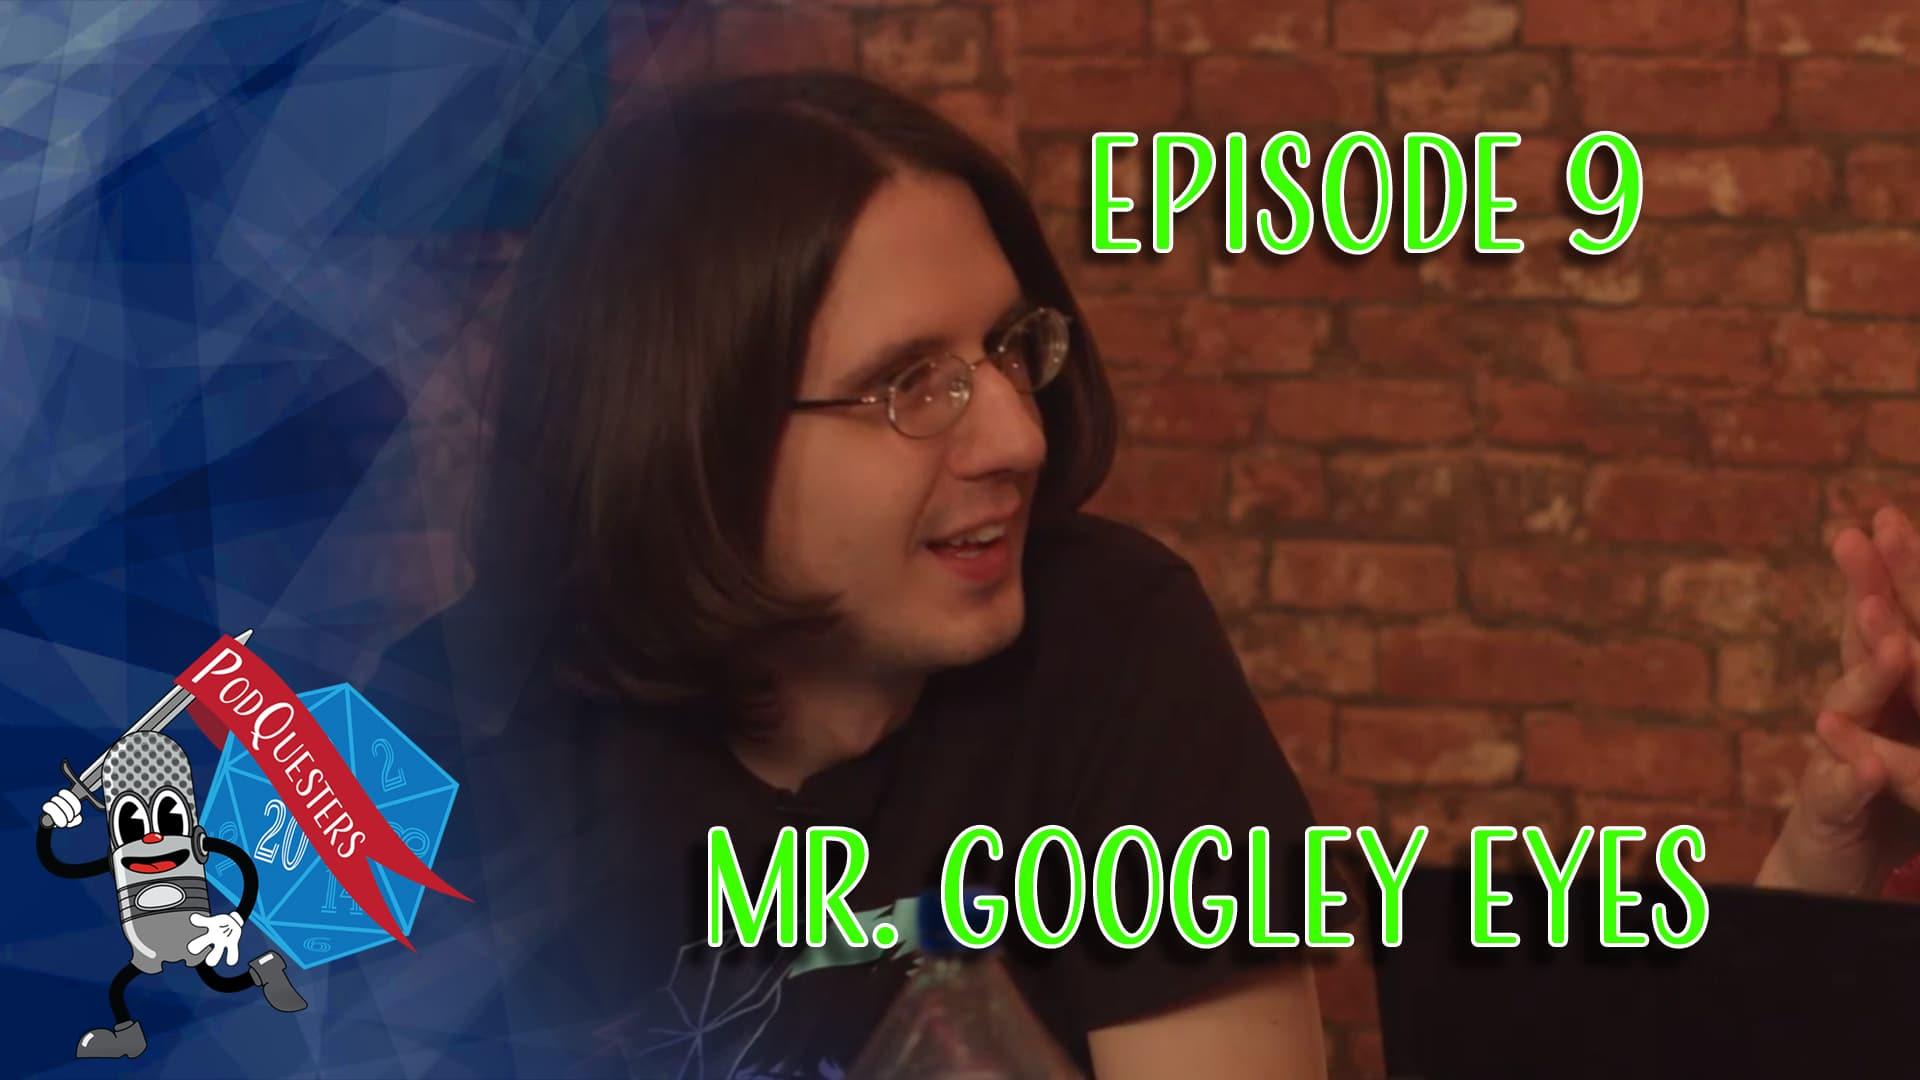 Podquesters - Episode 9: Mr. Googley Eyes